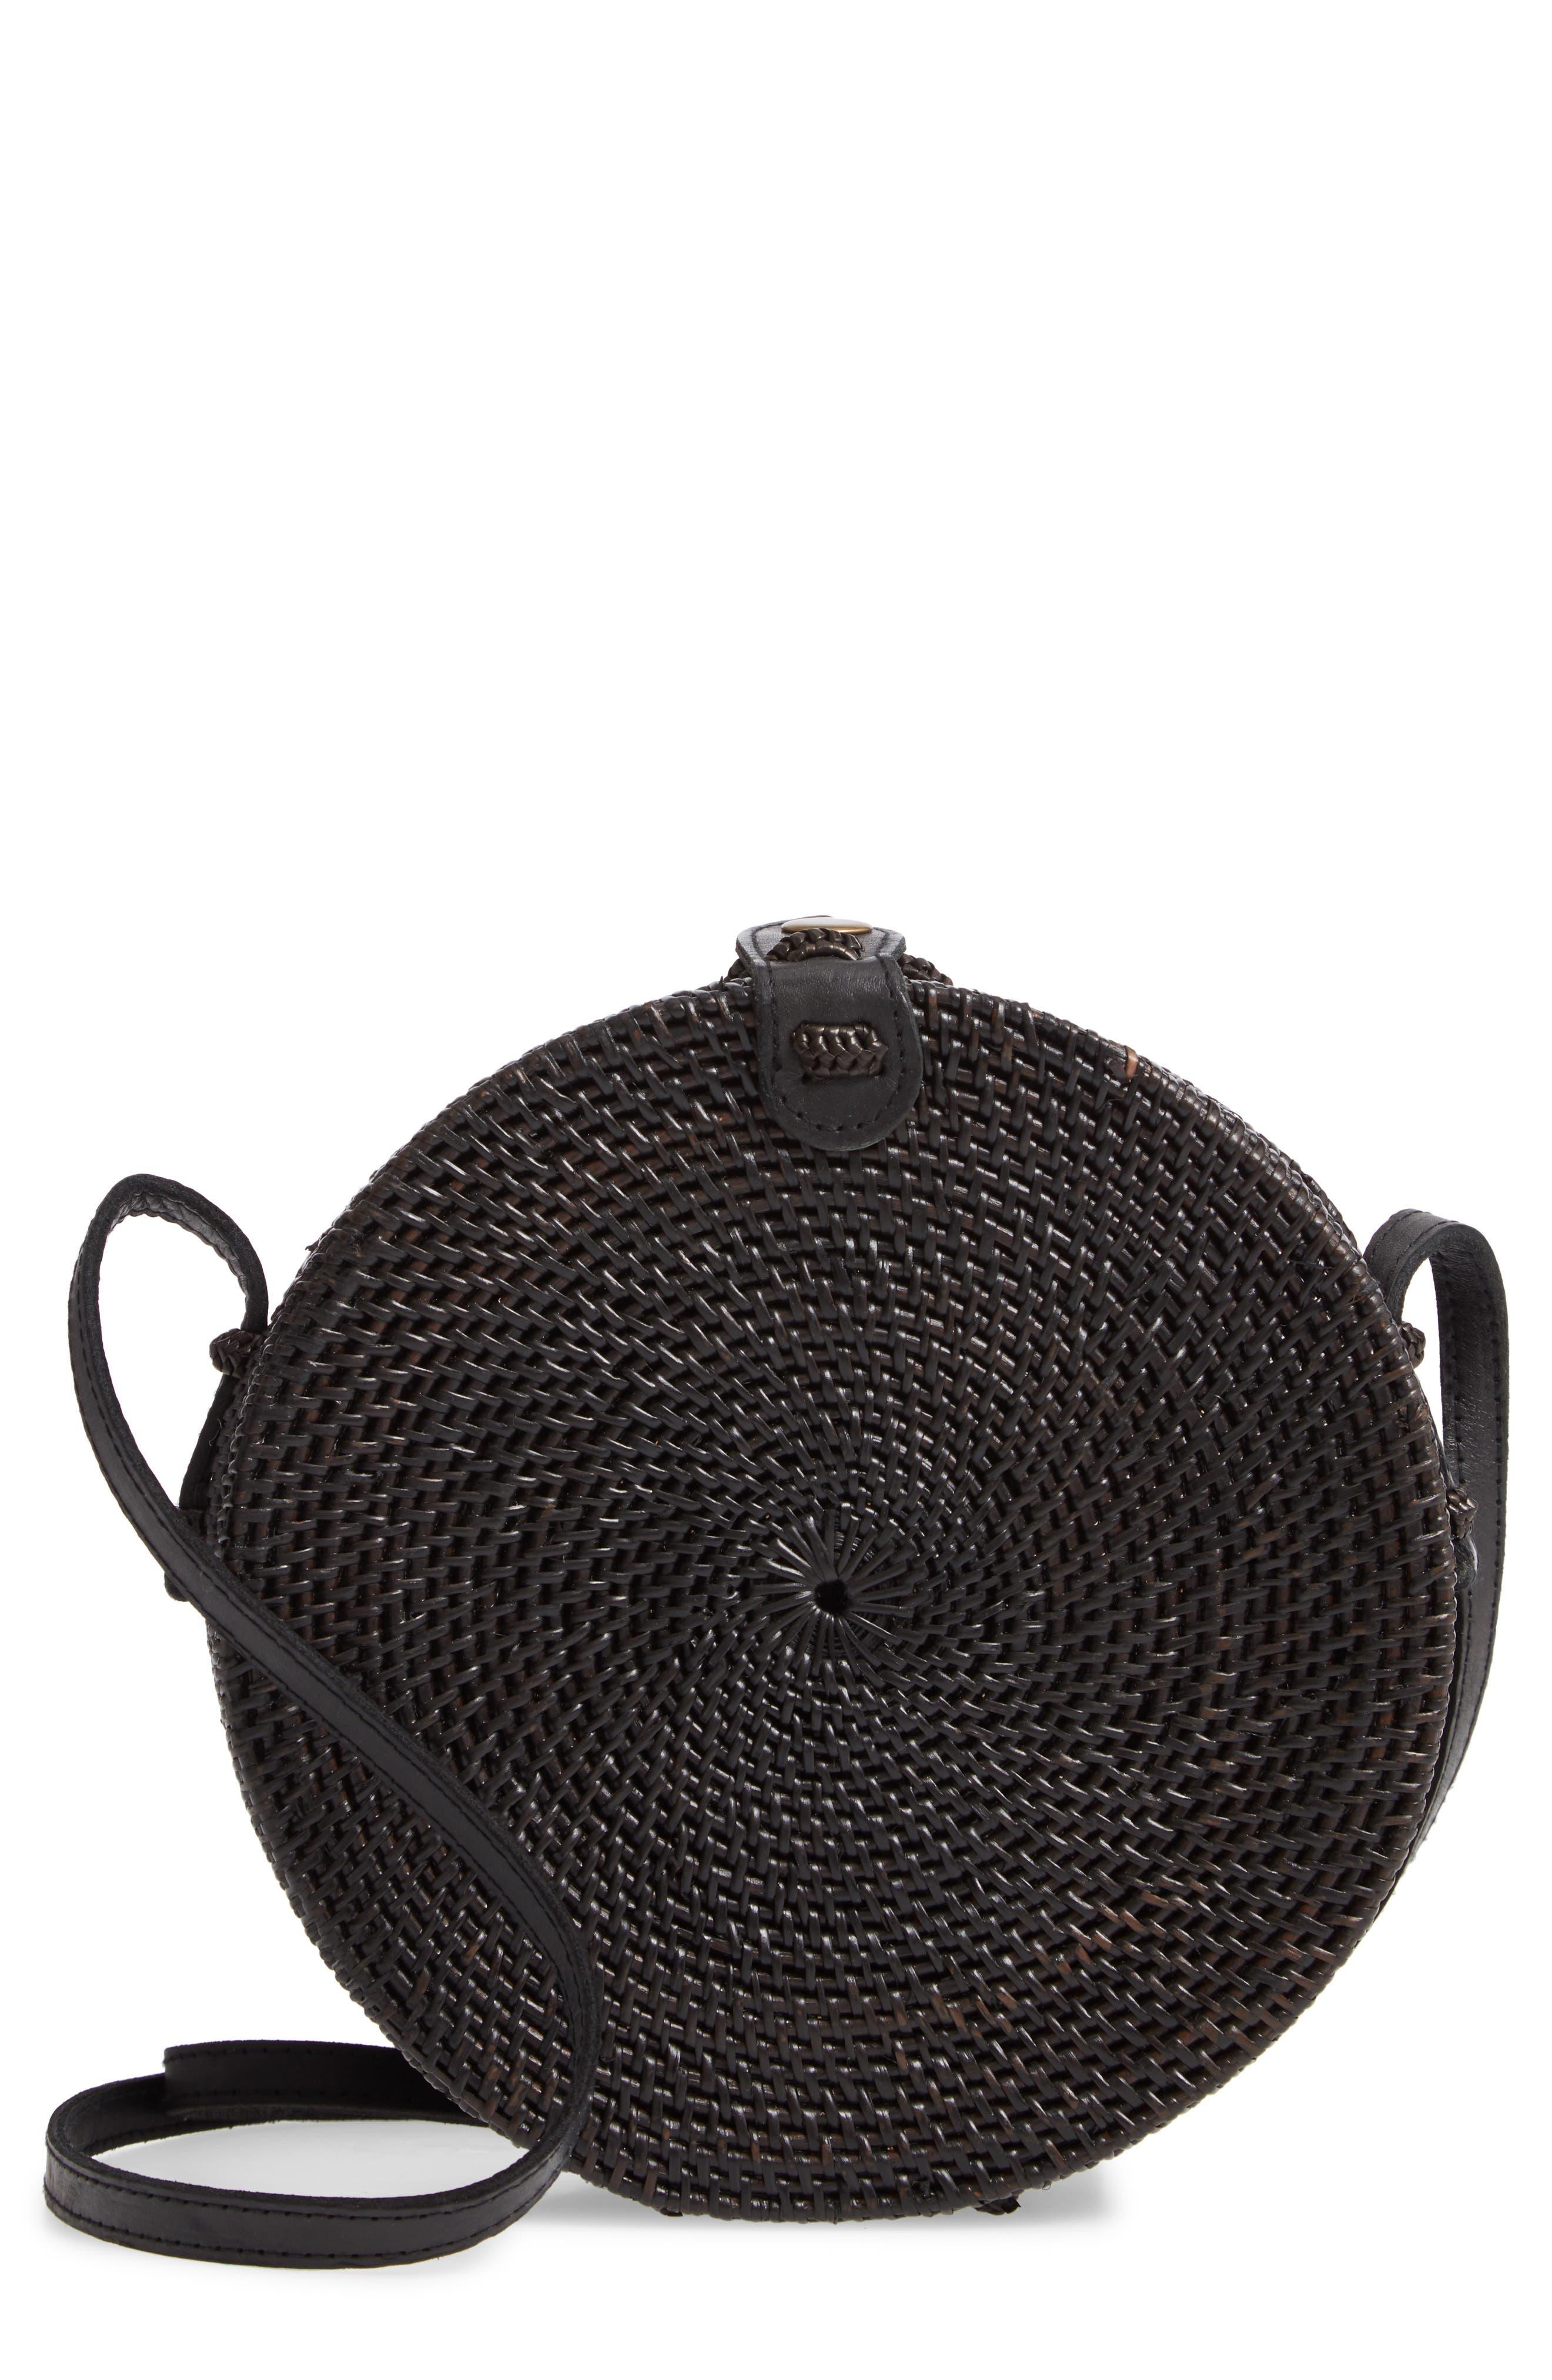 052a5b0990 Street Level Handbags   Purses